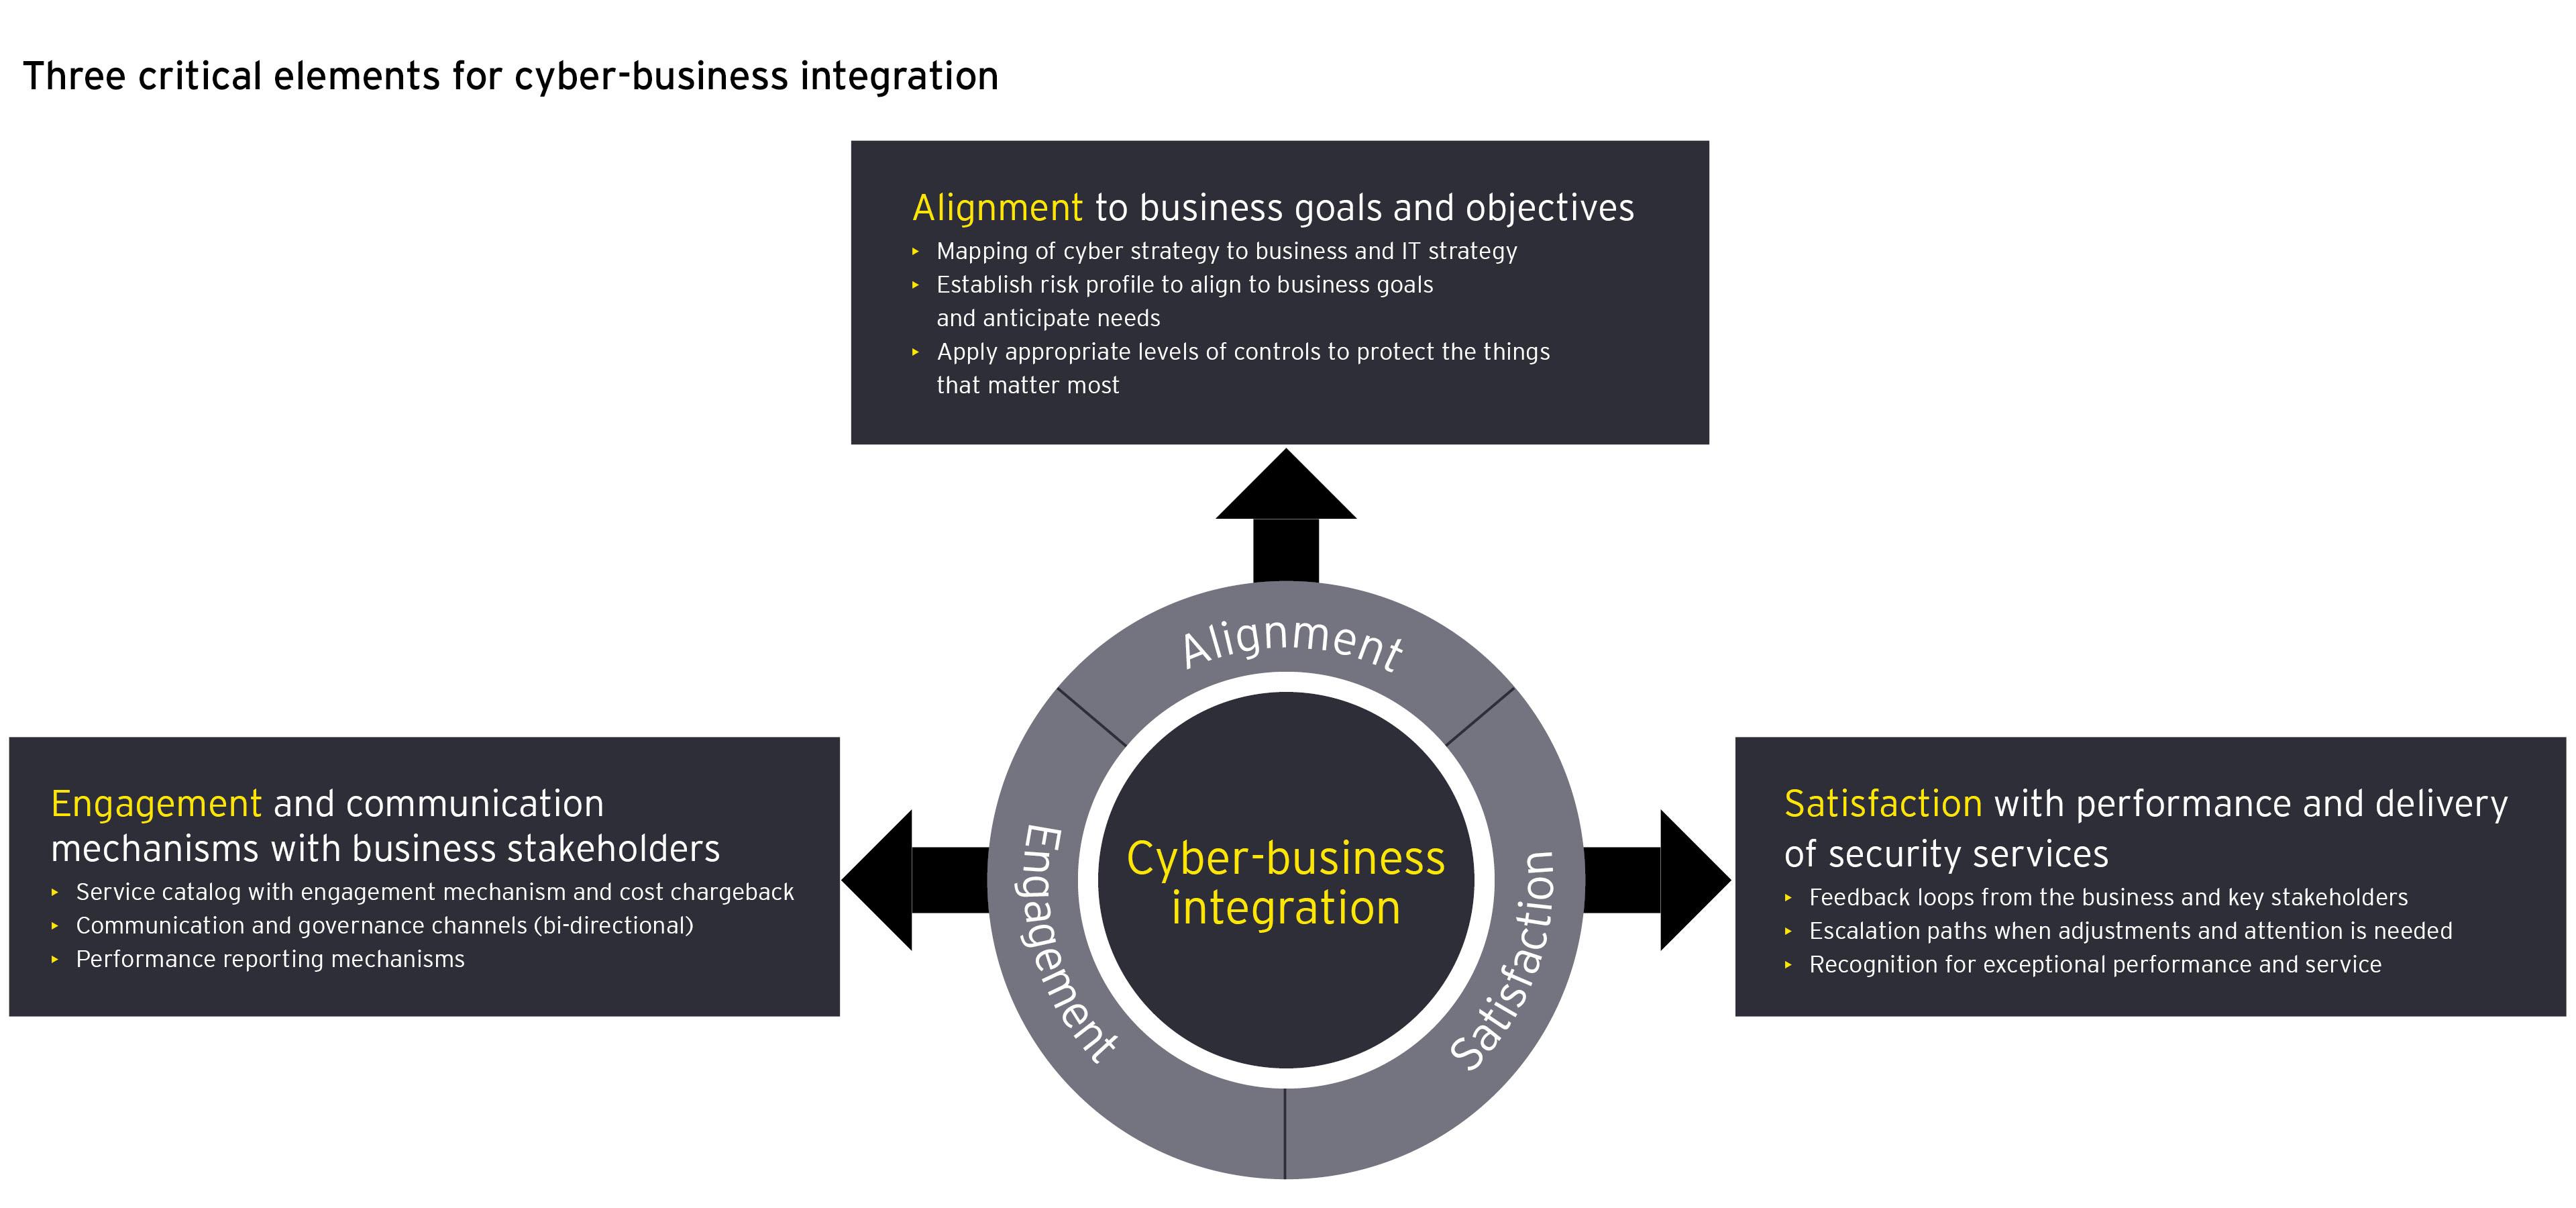 Cyber business intergration